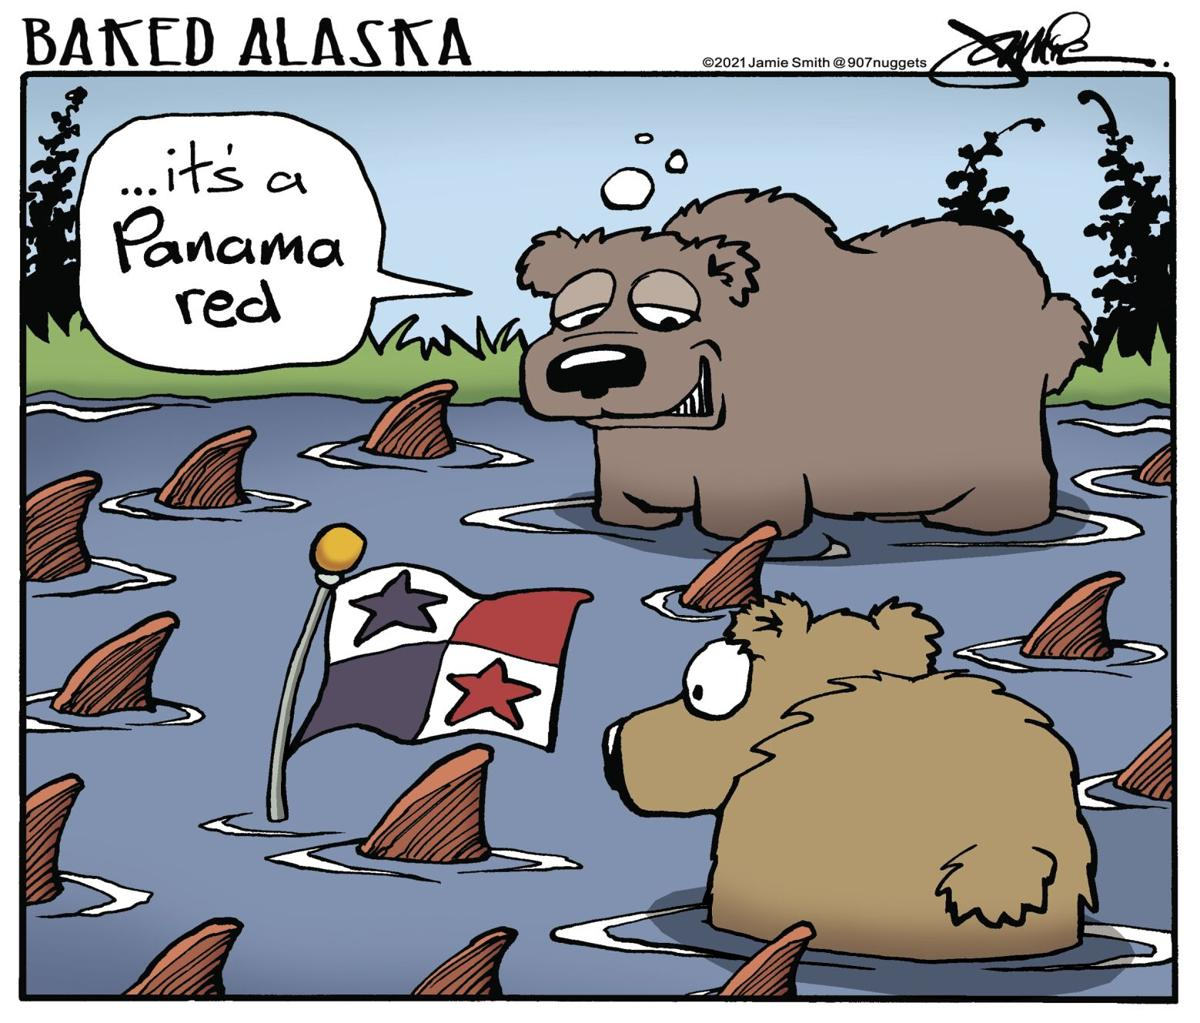 Baked Alaska - Panama